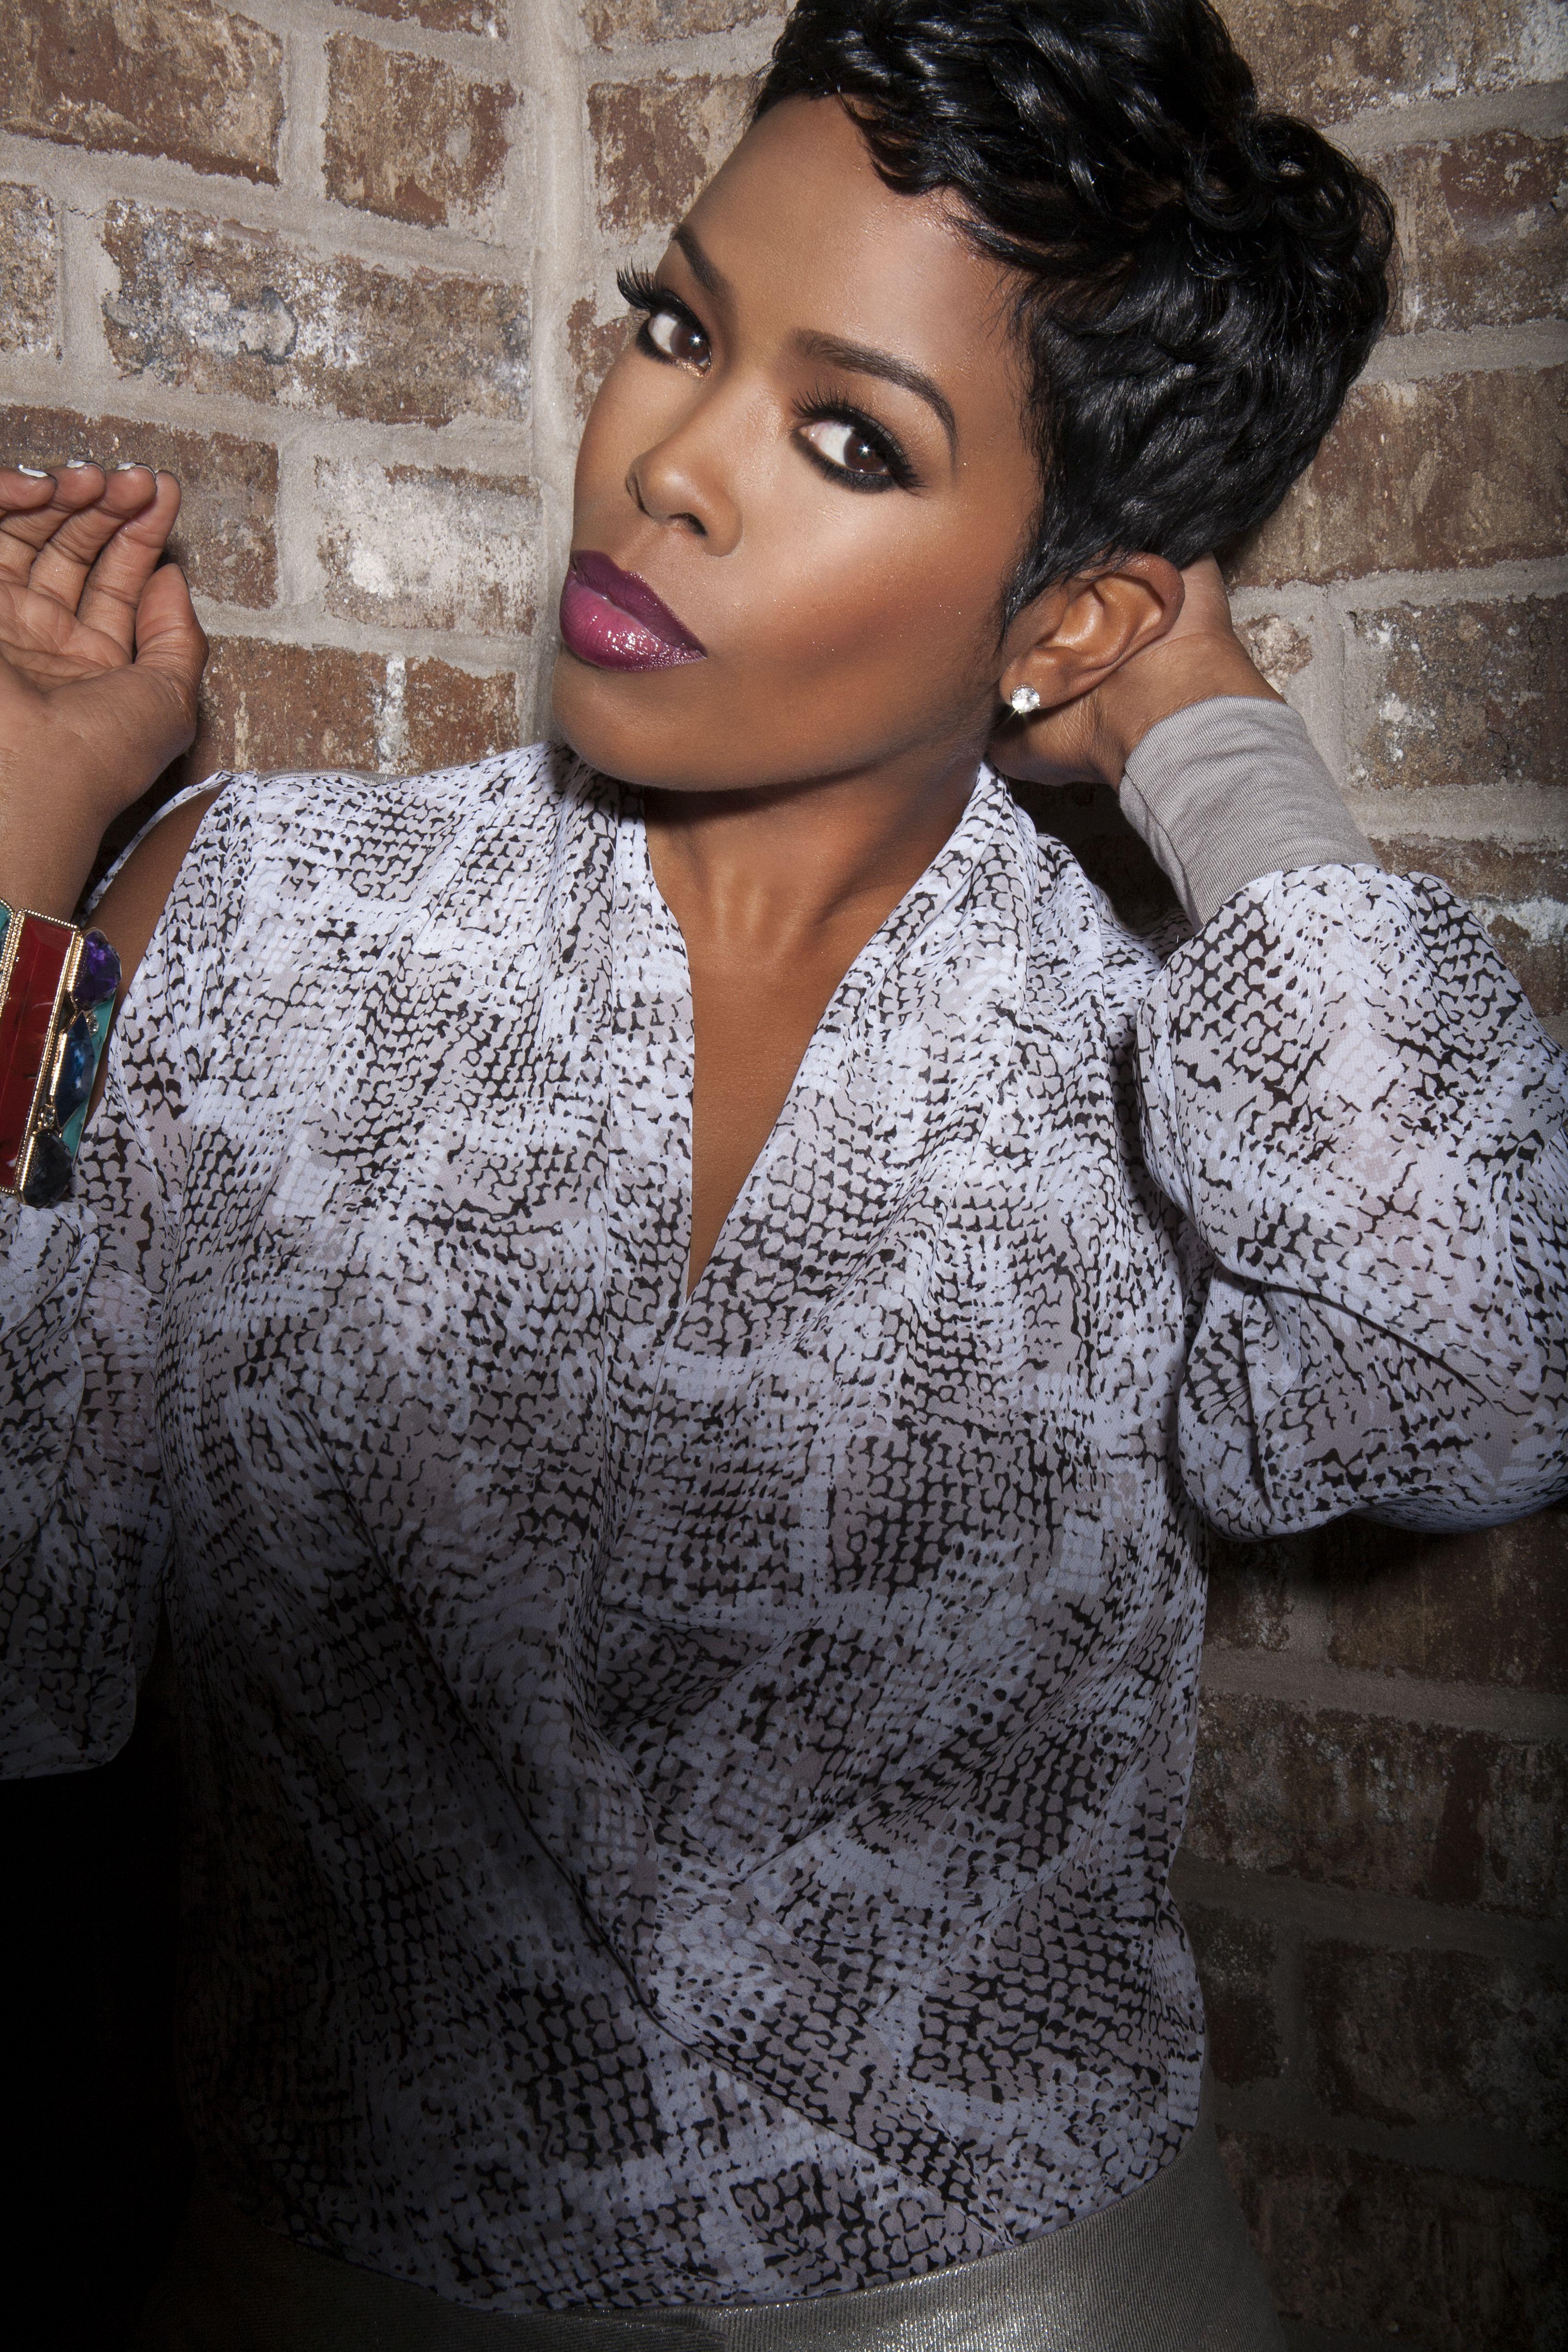 Malinda Williams Uptv Uplifting Entertainment Family